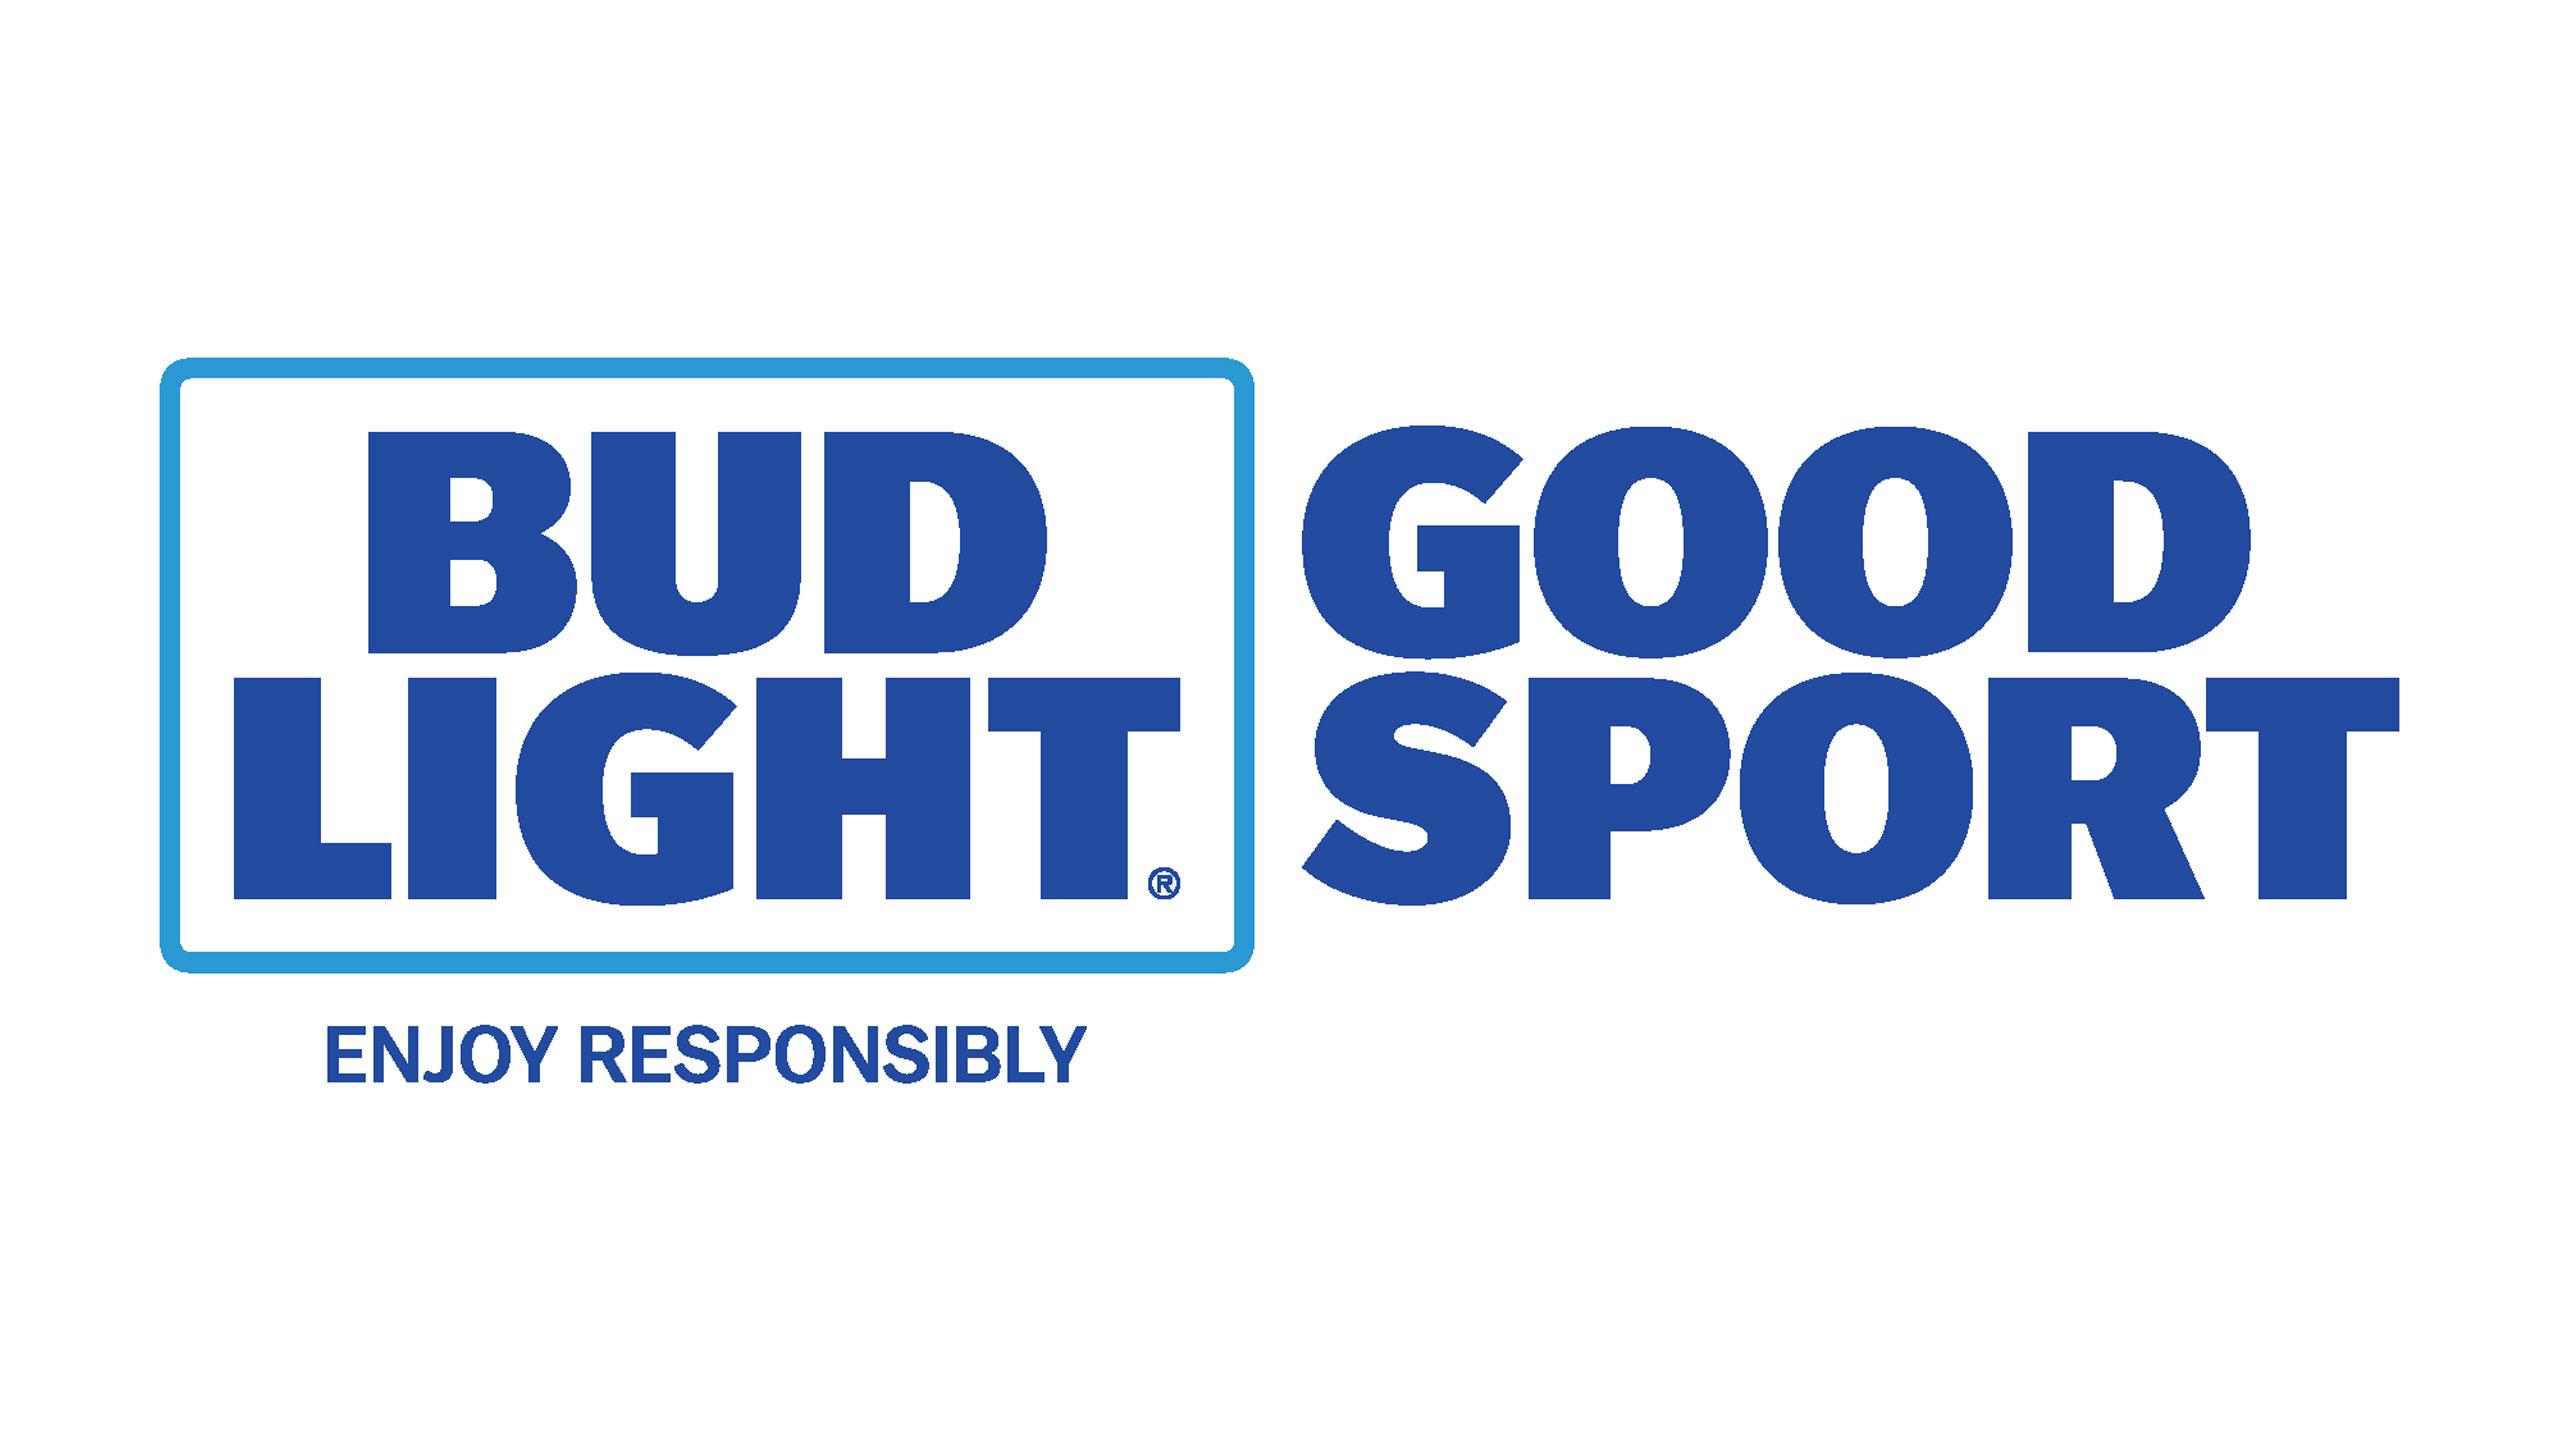 Bud Light Good Sport